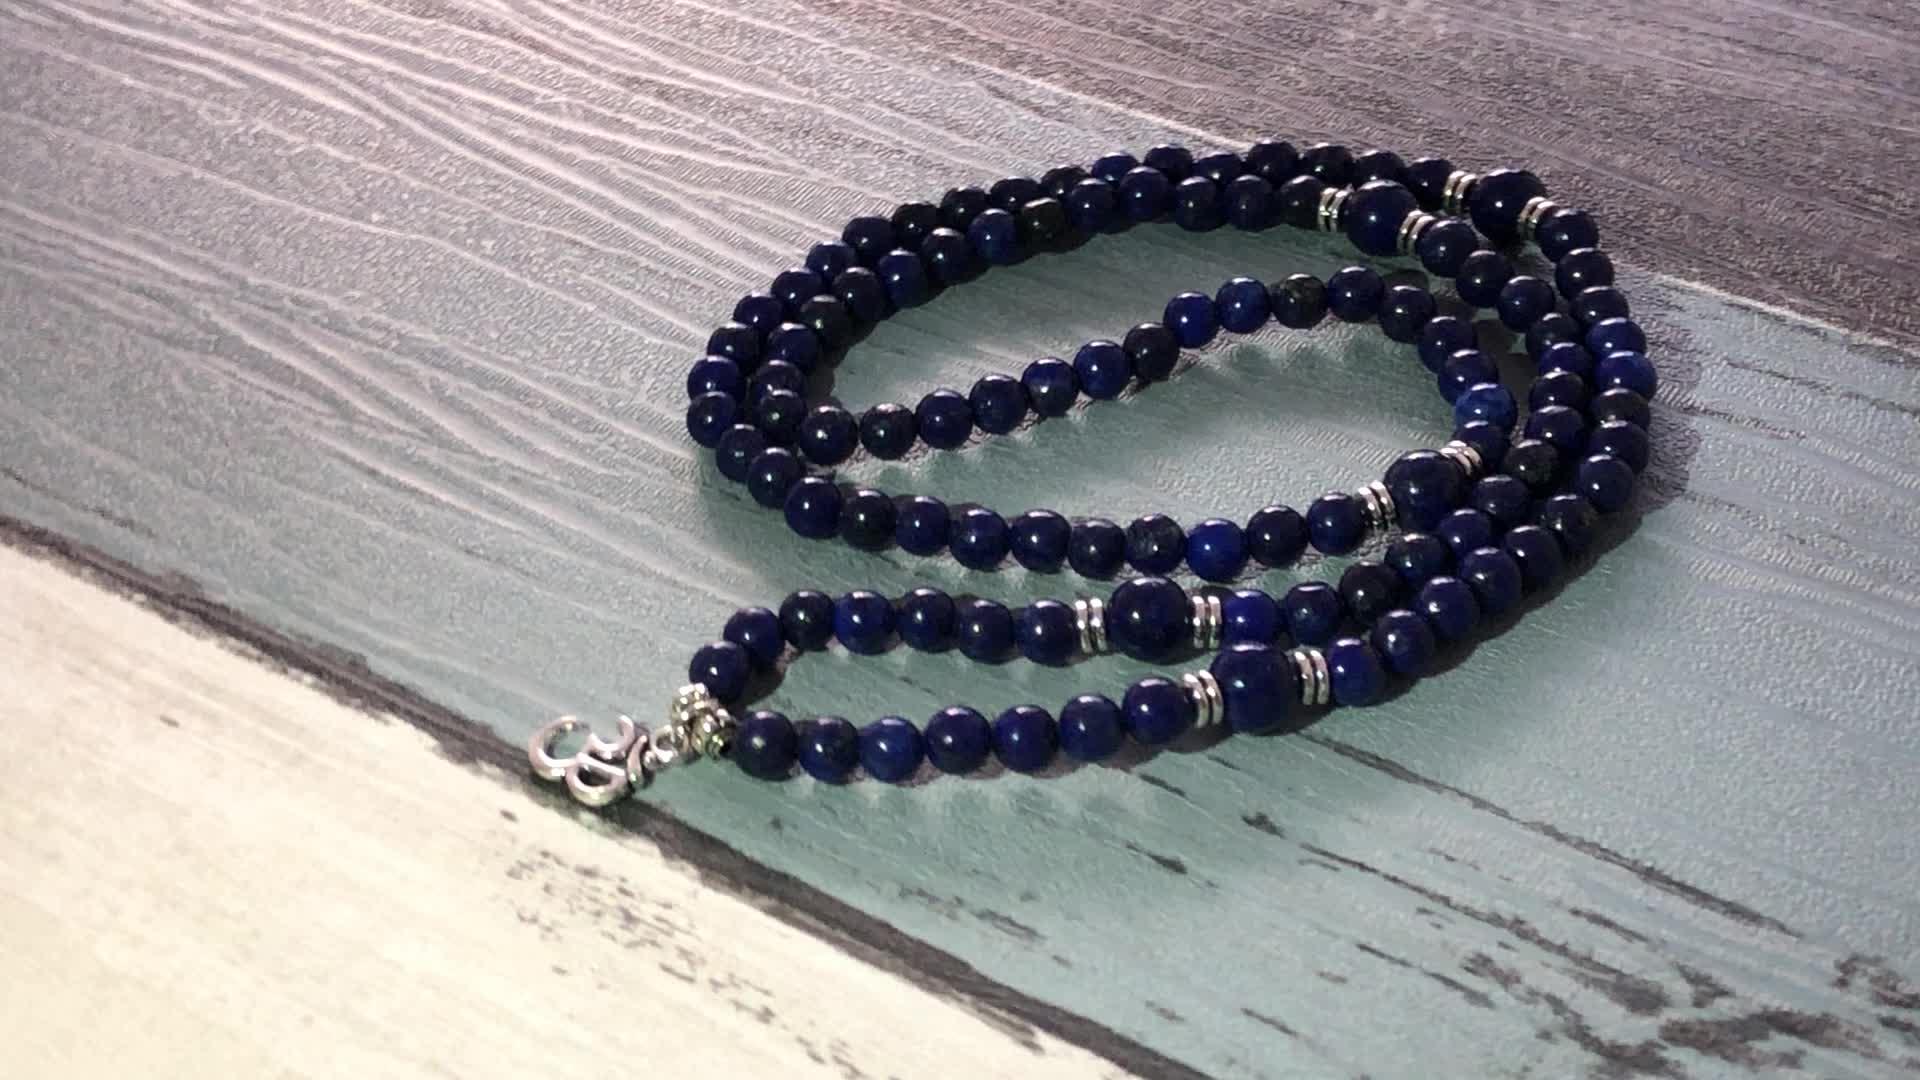 SN2000 Clear Quartz Charm Jewelry 4 Wraps Around Women Yoga Bracelet Handmade Natural Stone  6mm Amethyst Beaded Mala Bracelet